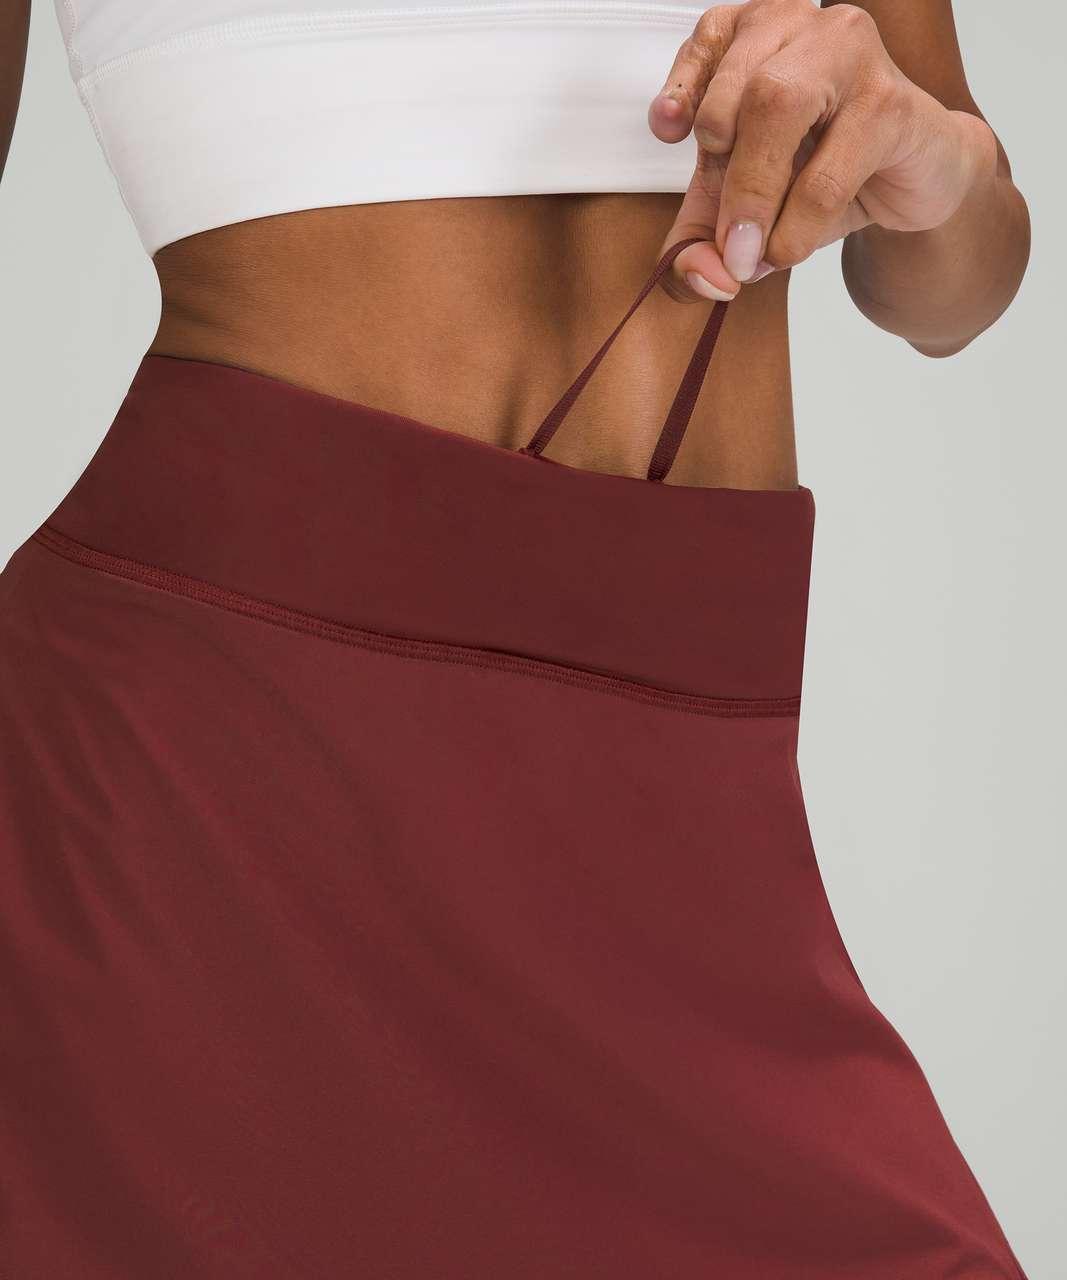 Lululemon Play Off The Pleats Mid Rise Skirt - Red Merlot